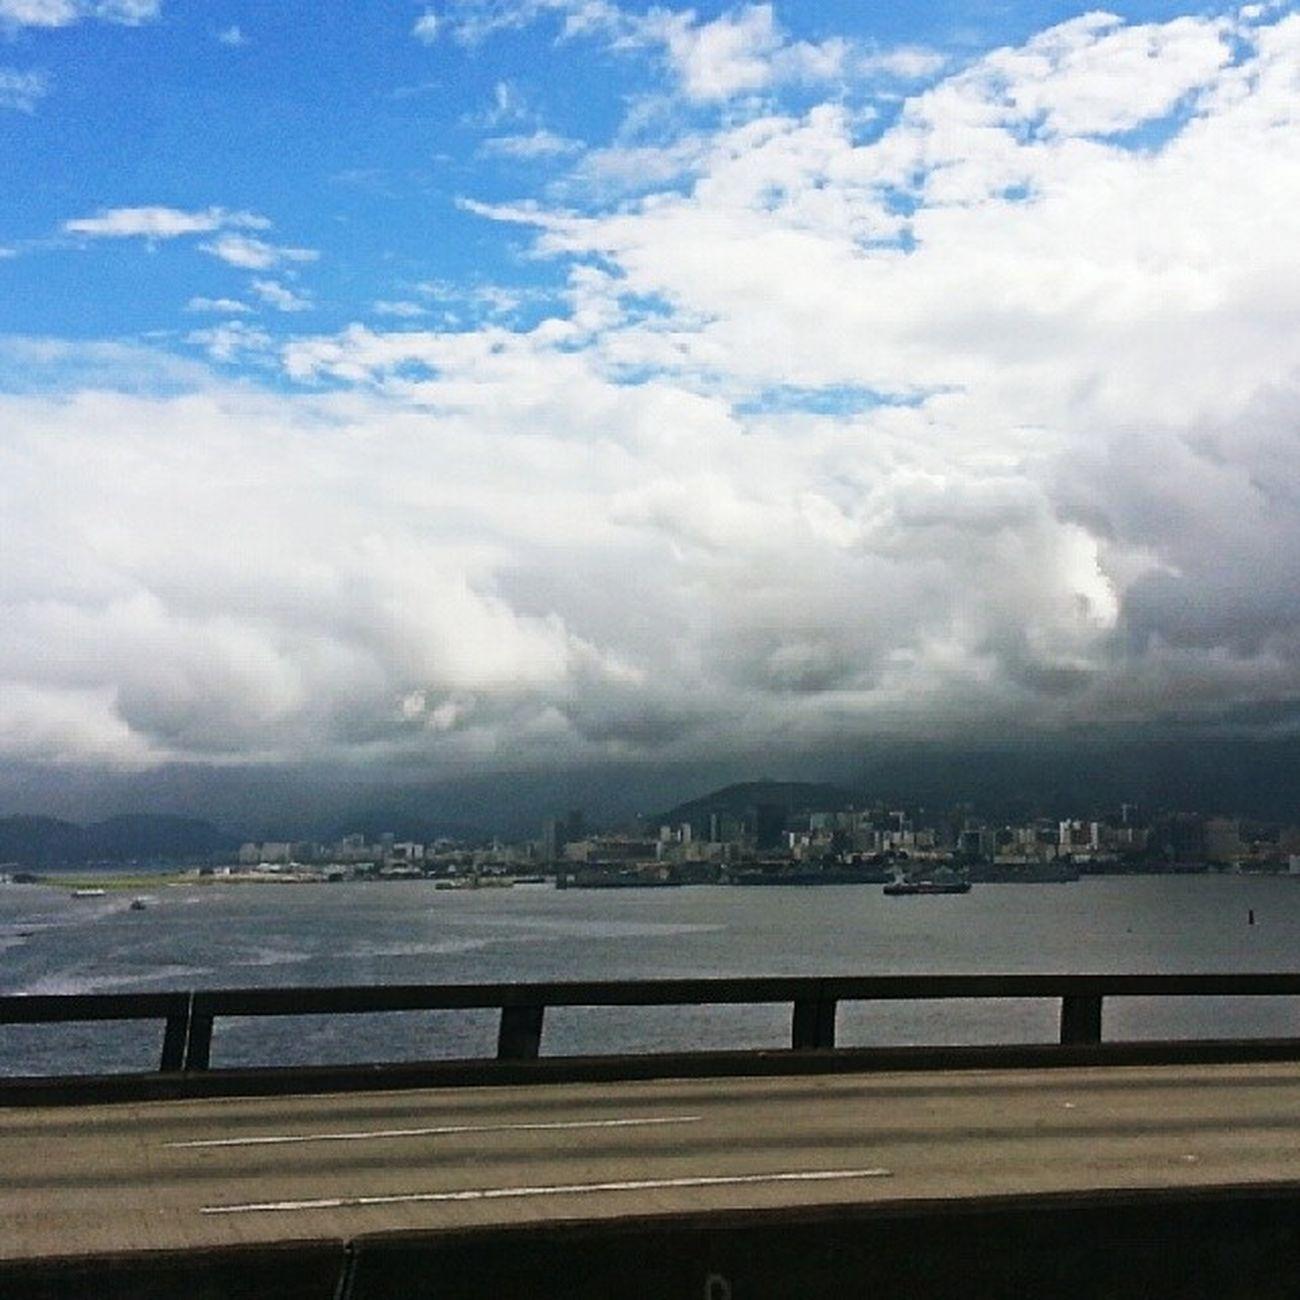 Pontepresidentecostaesilva Rio